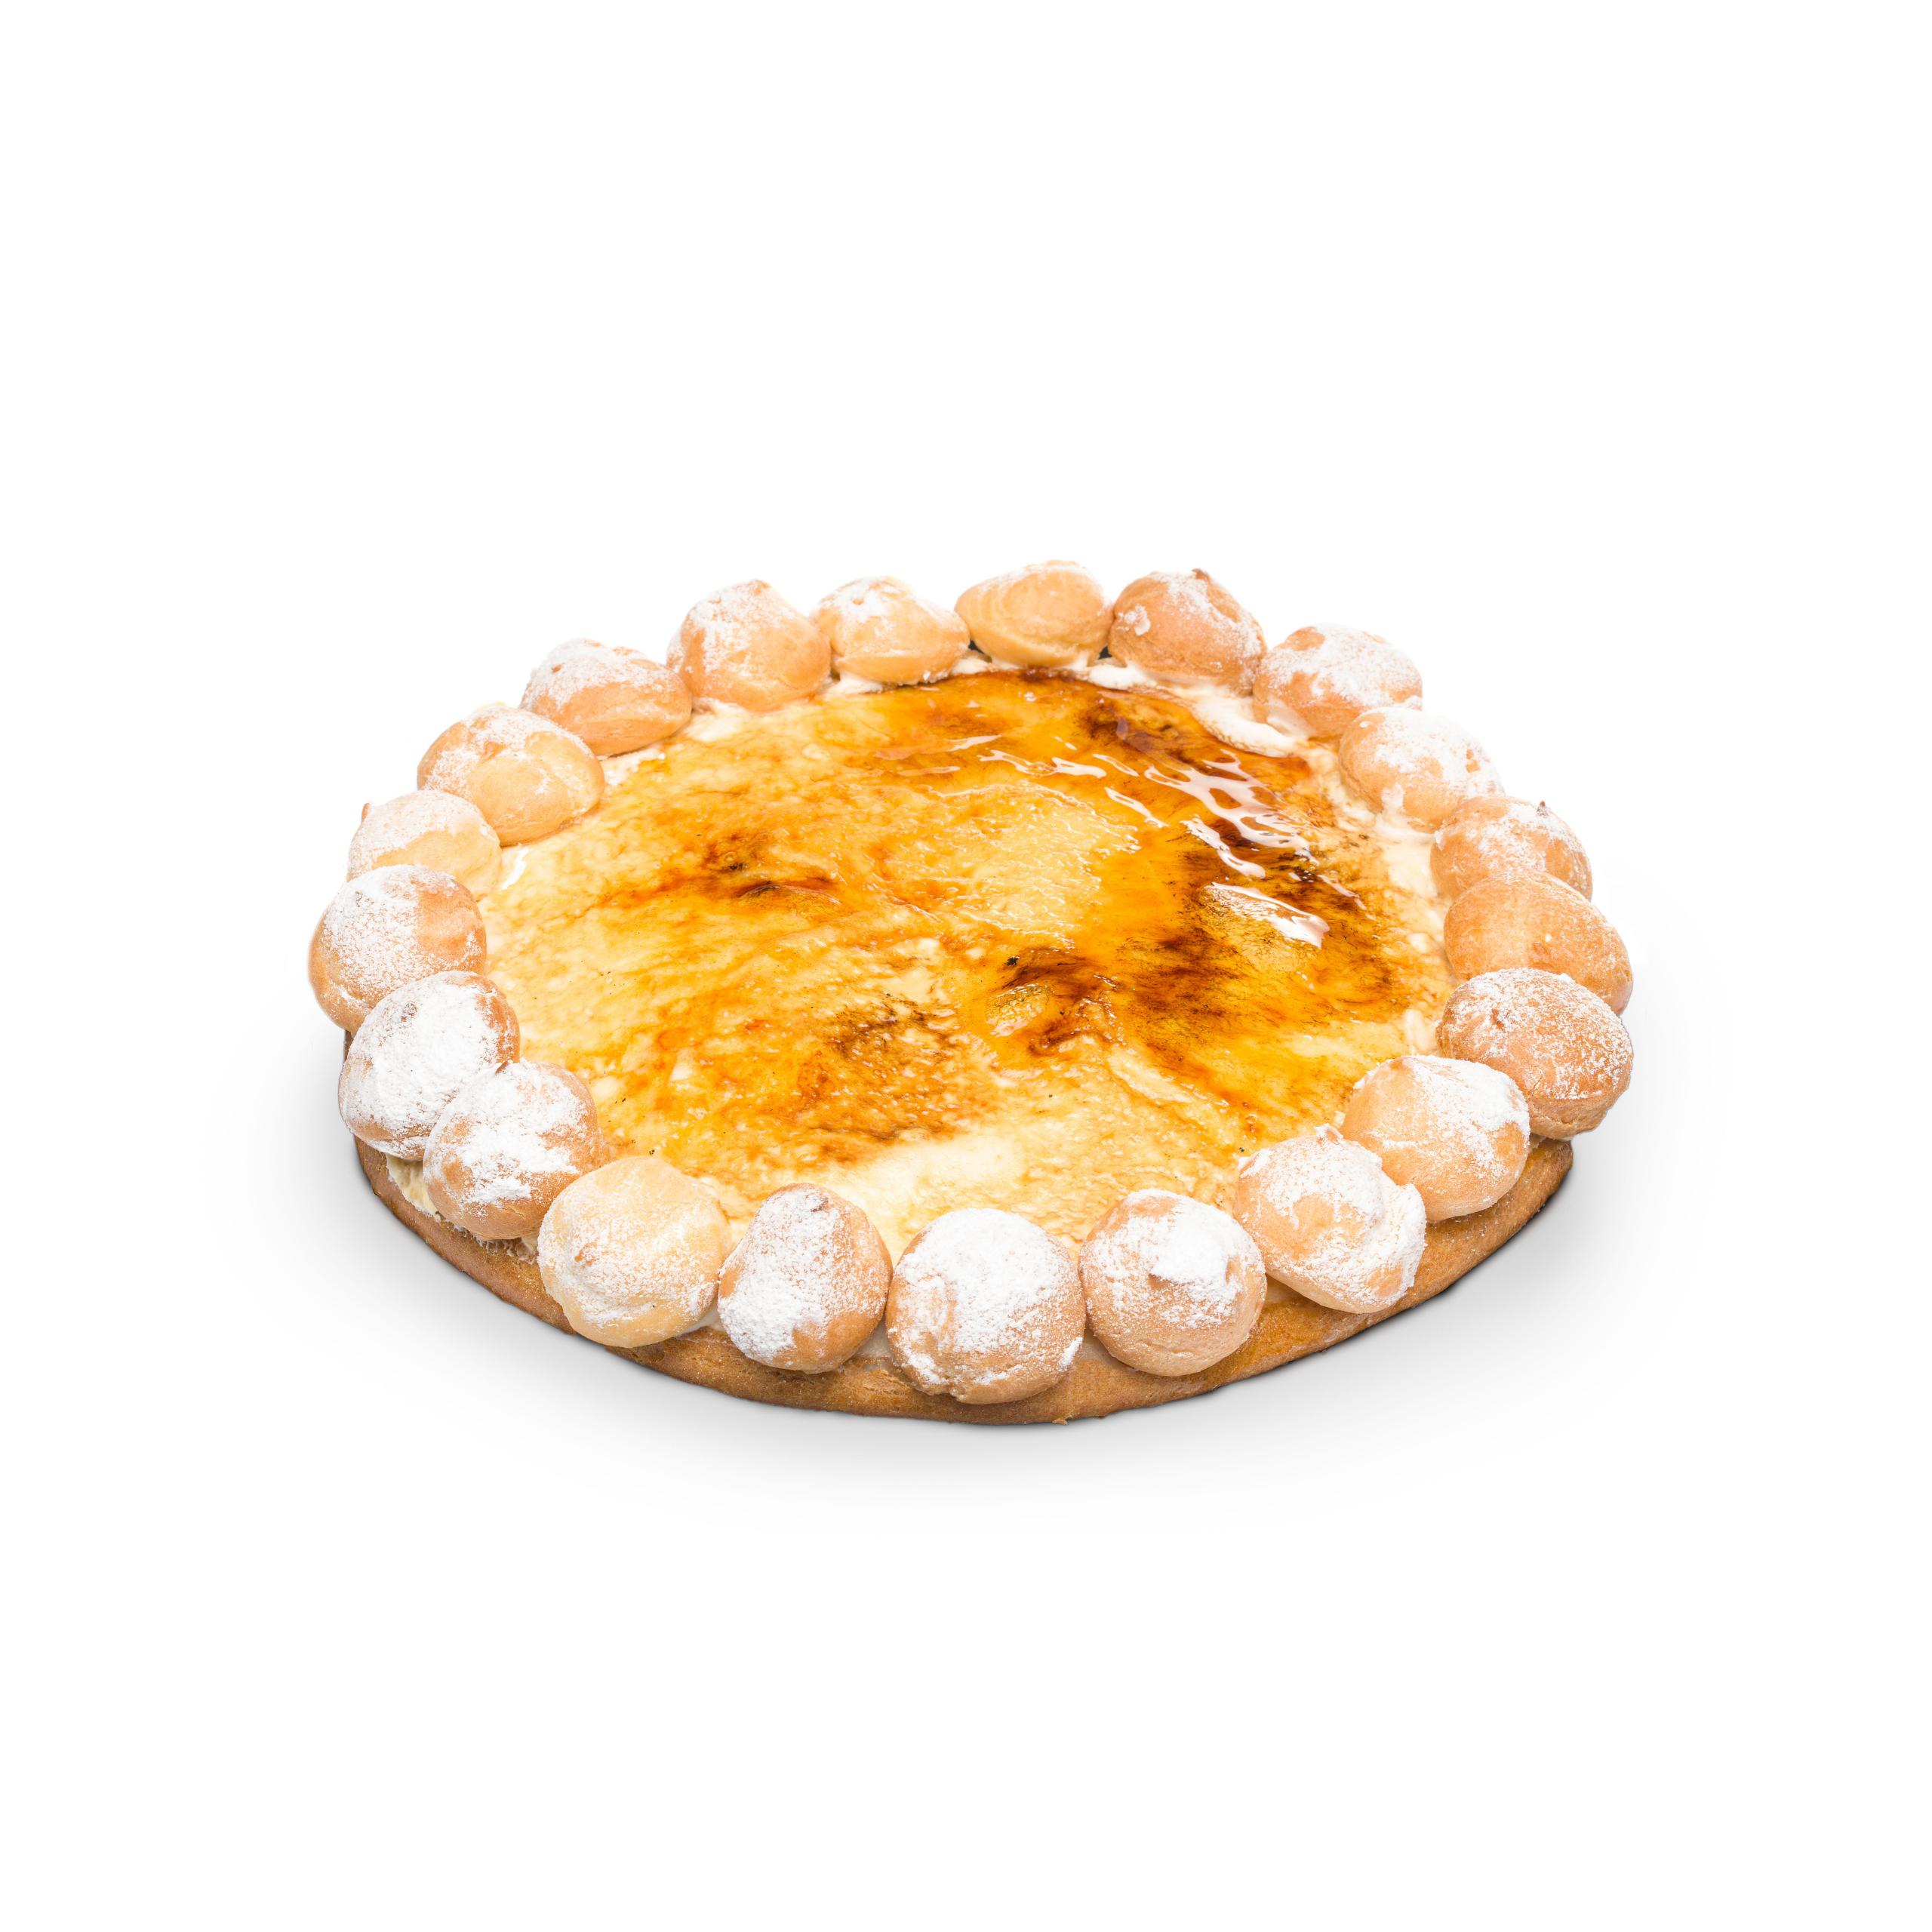 Beschle ST. Honoré Midi Torte